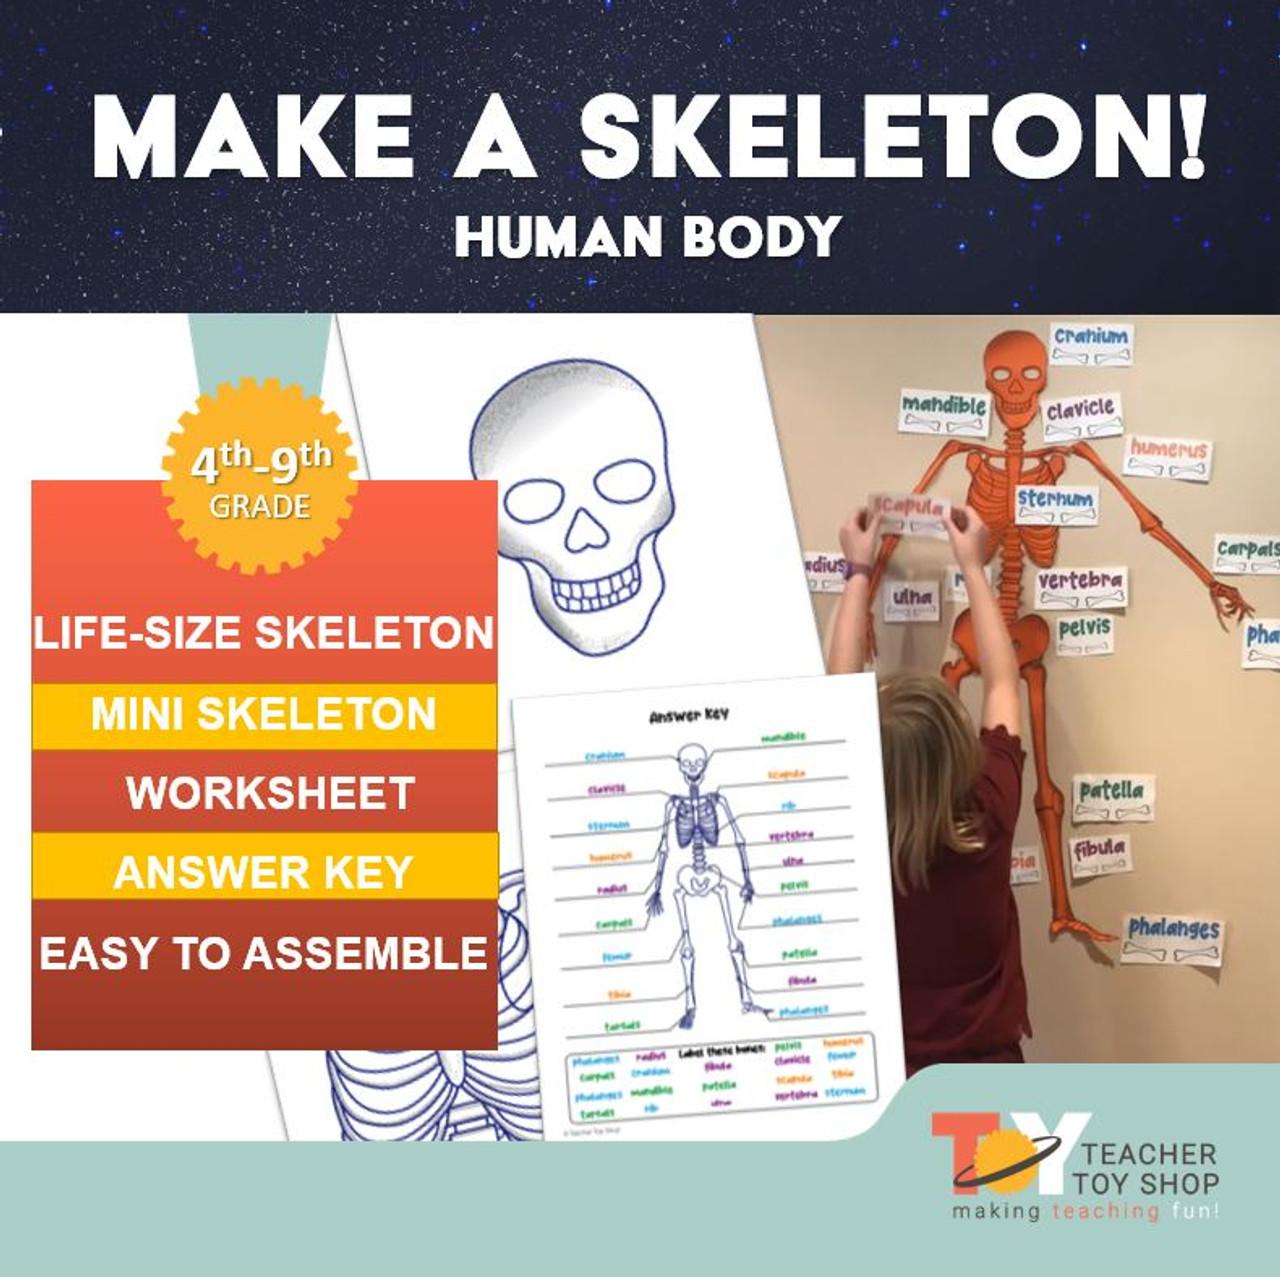 Make A Skeleton!